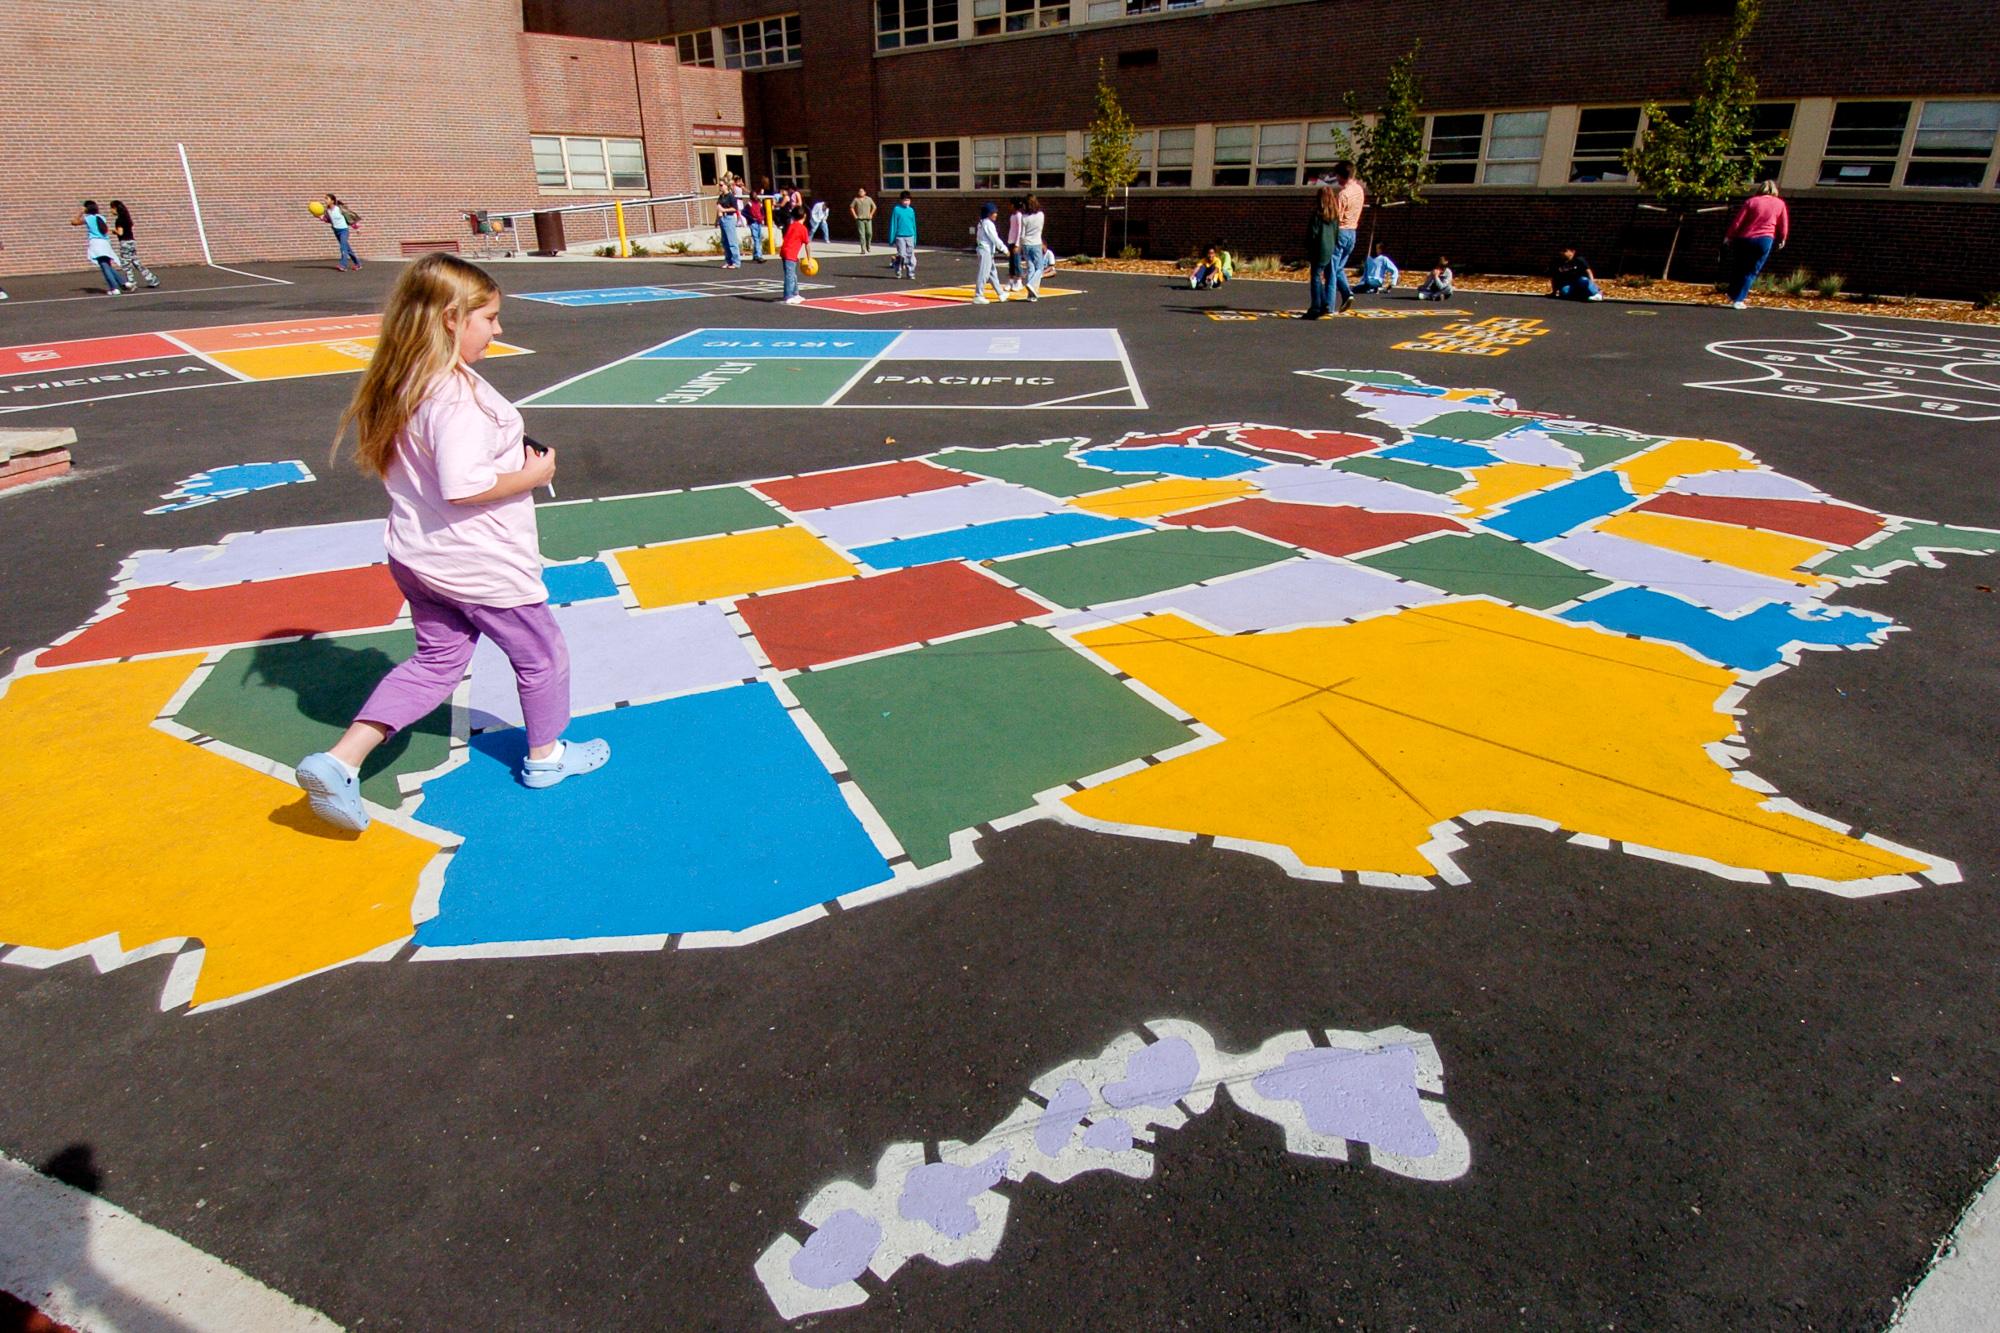 School playground learning landscape educational world map